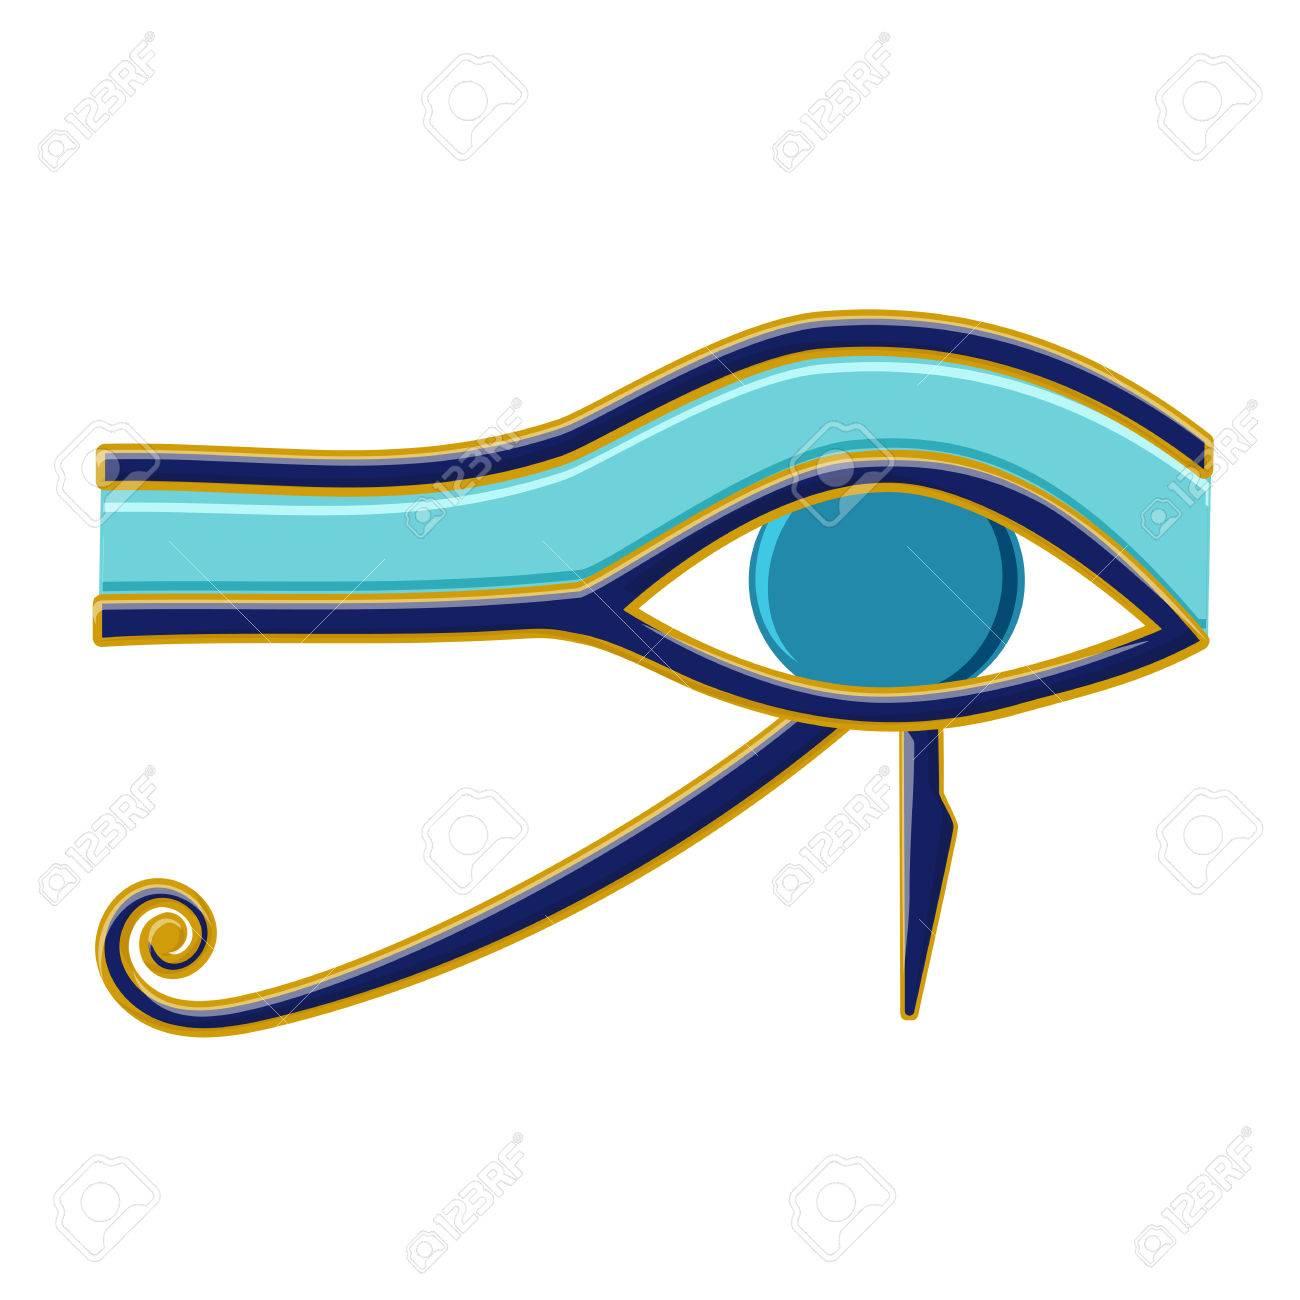 Egyptian eye of horus symbol religion and myths ancient egypt egyptian eye of horus symbol religion and myths ancient egypt stock vector 74801681 biocorpaavc Images